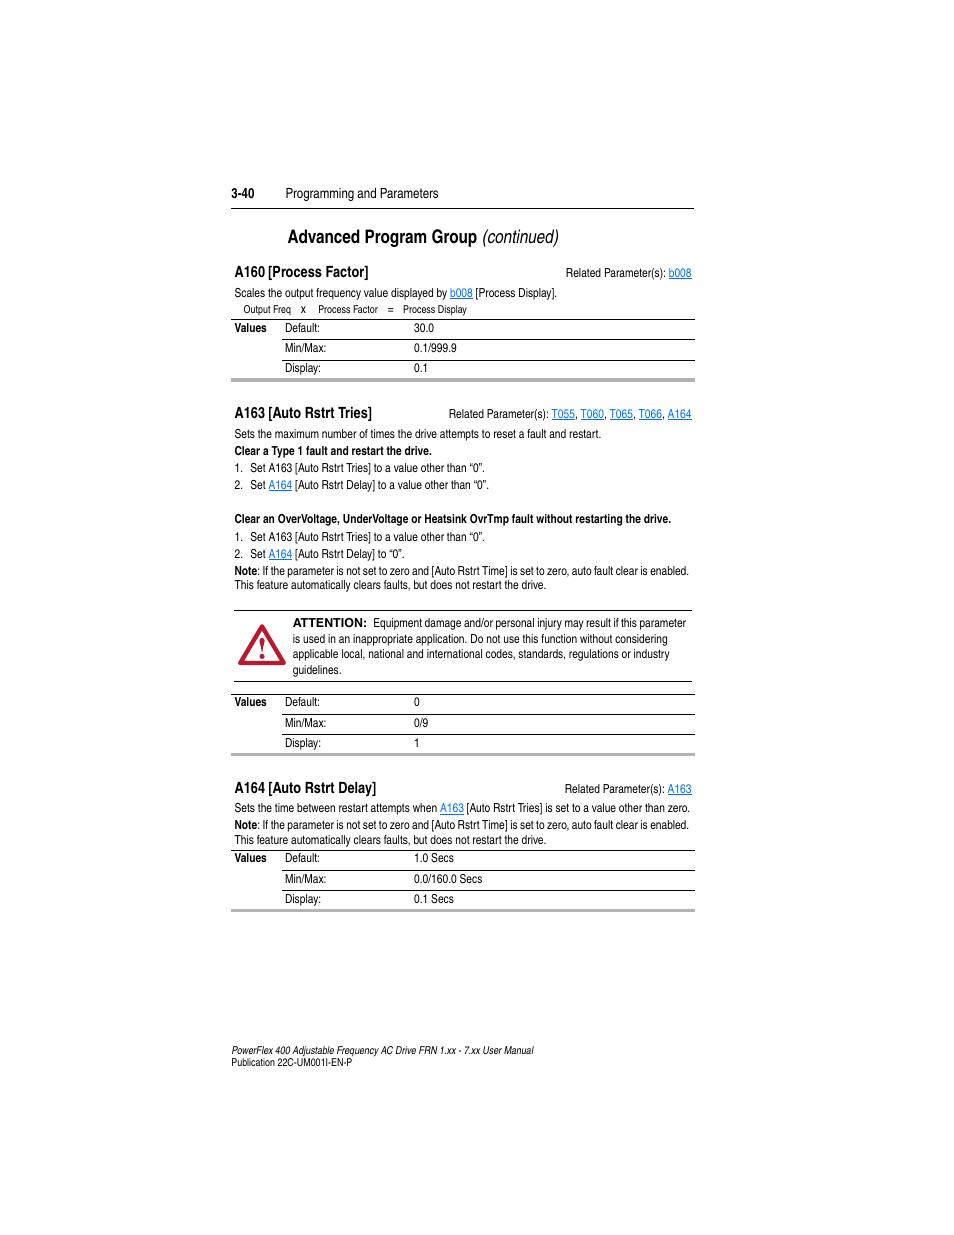 a160 a163 advanced program group continued rockwell automation rh manualsdir com